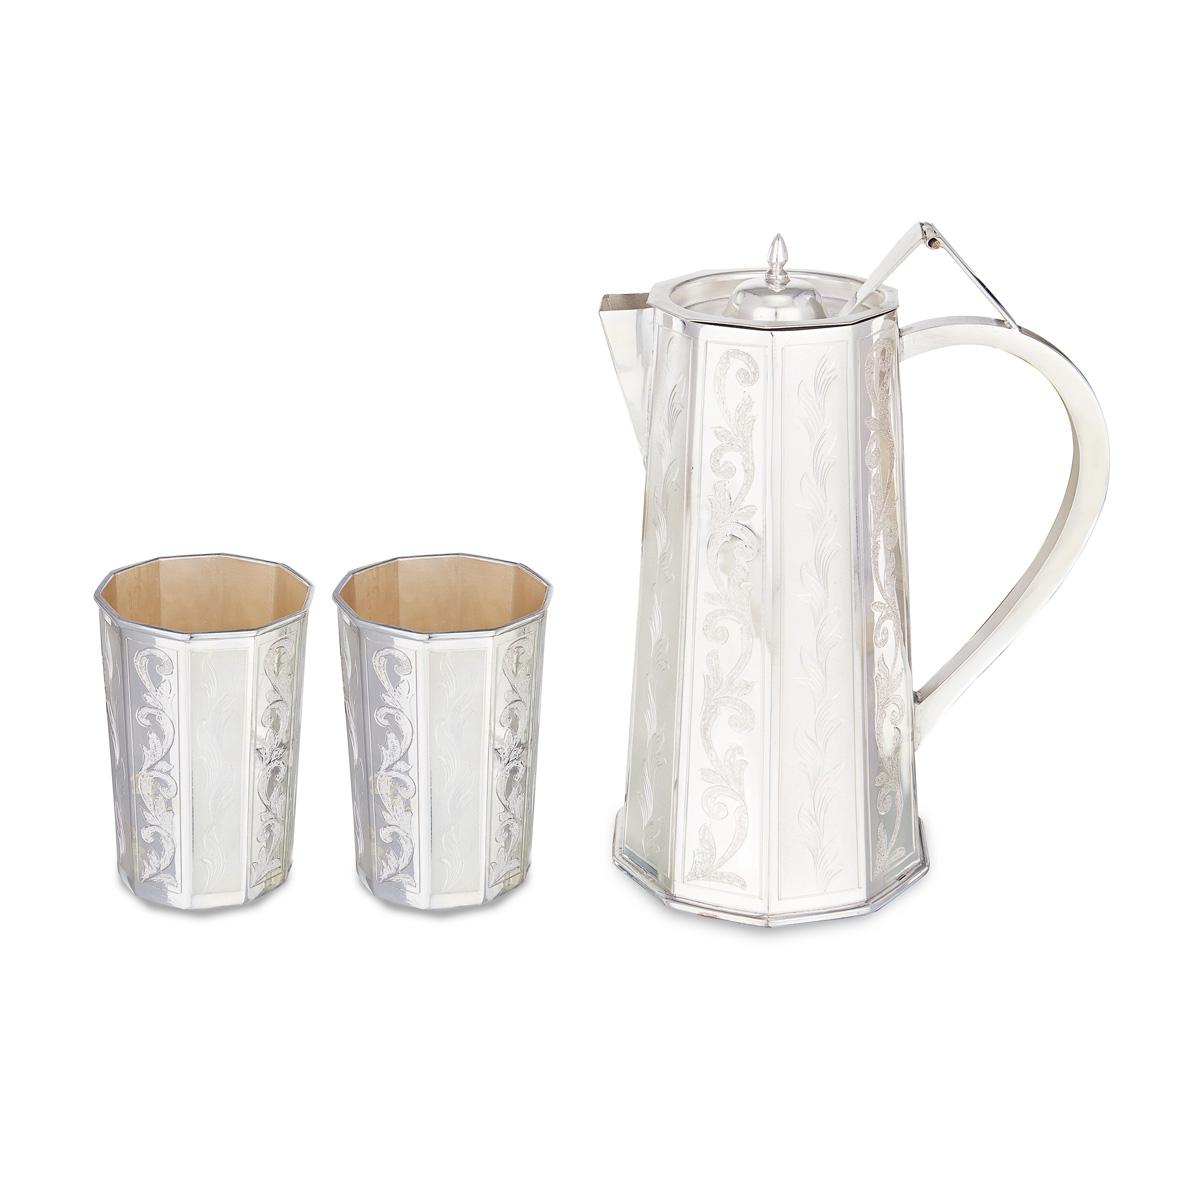 Silver Engraved Jug Set